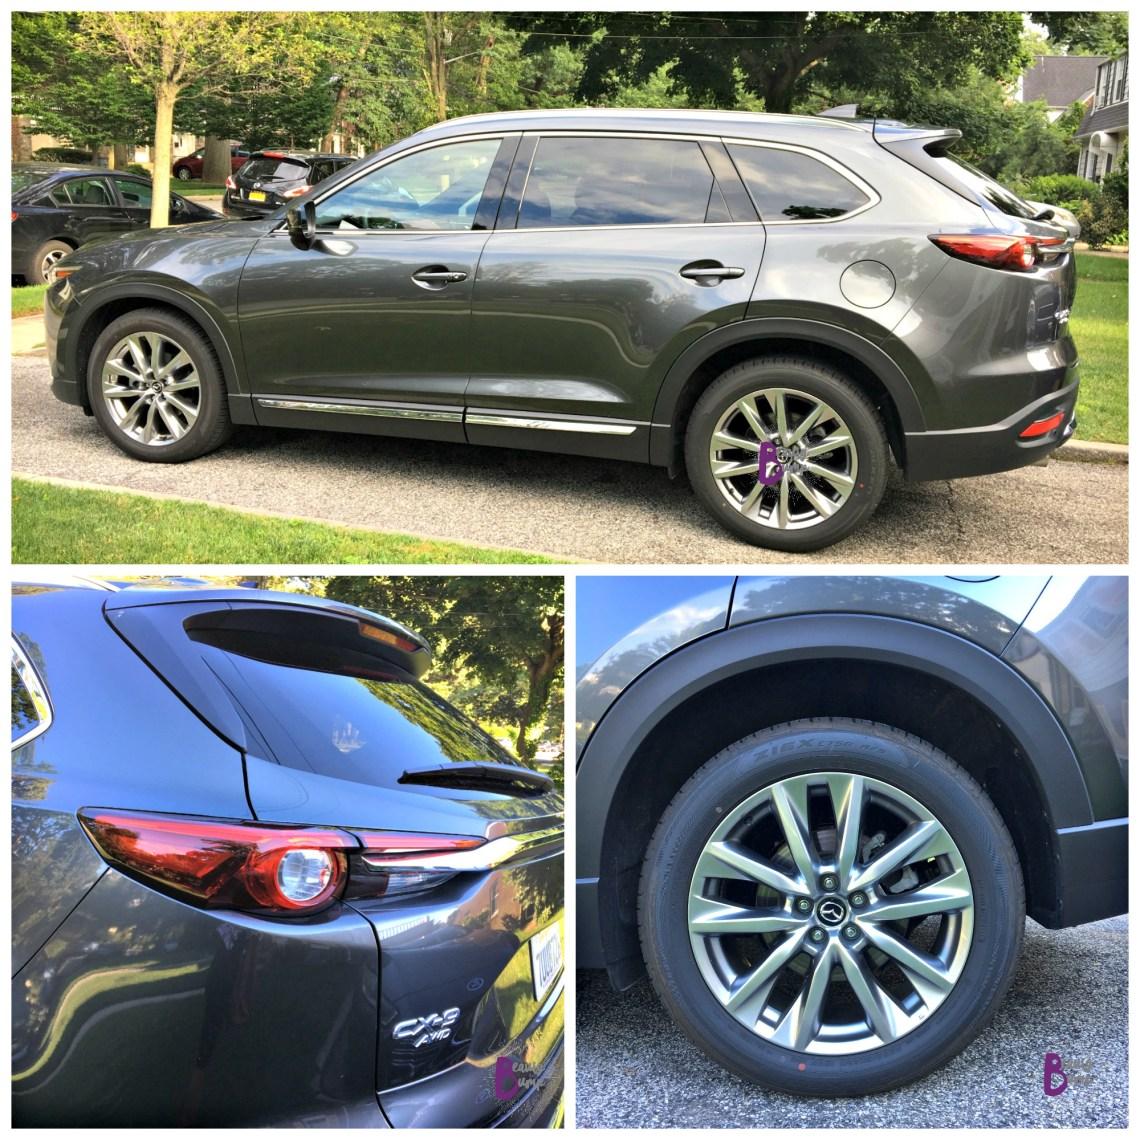 2017 Mazda CX-9 Signature AWD Curves